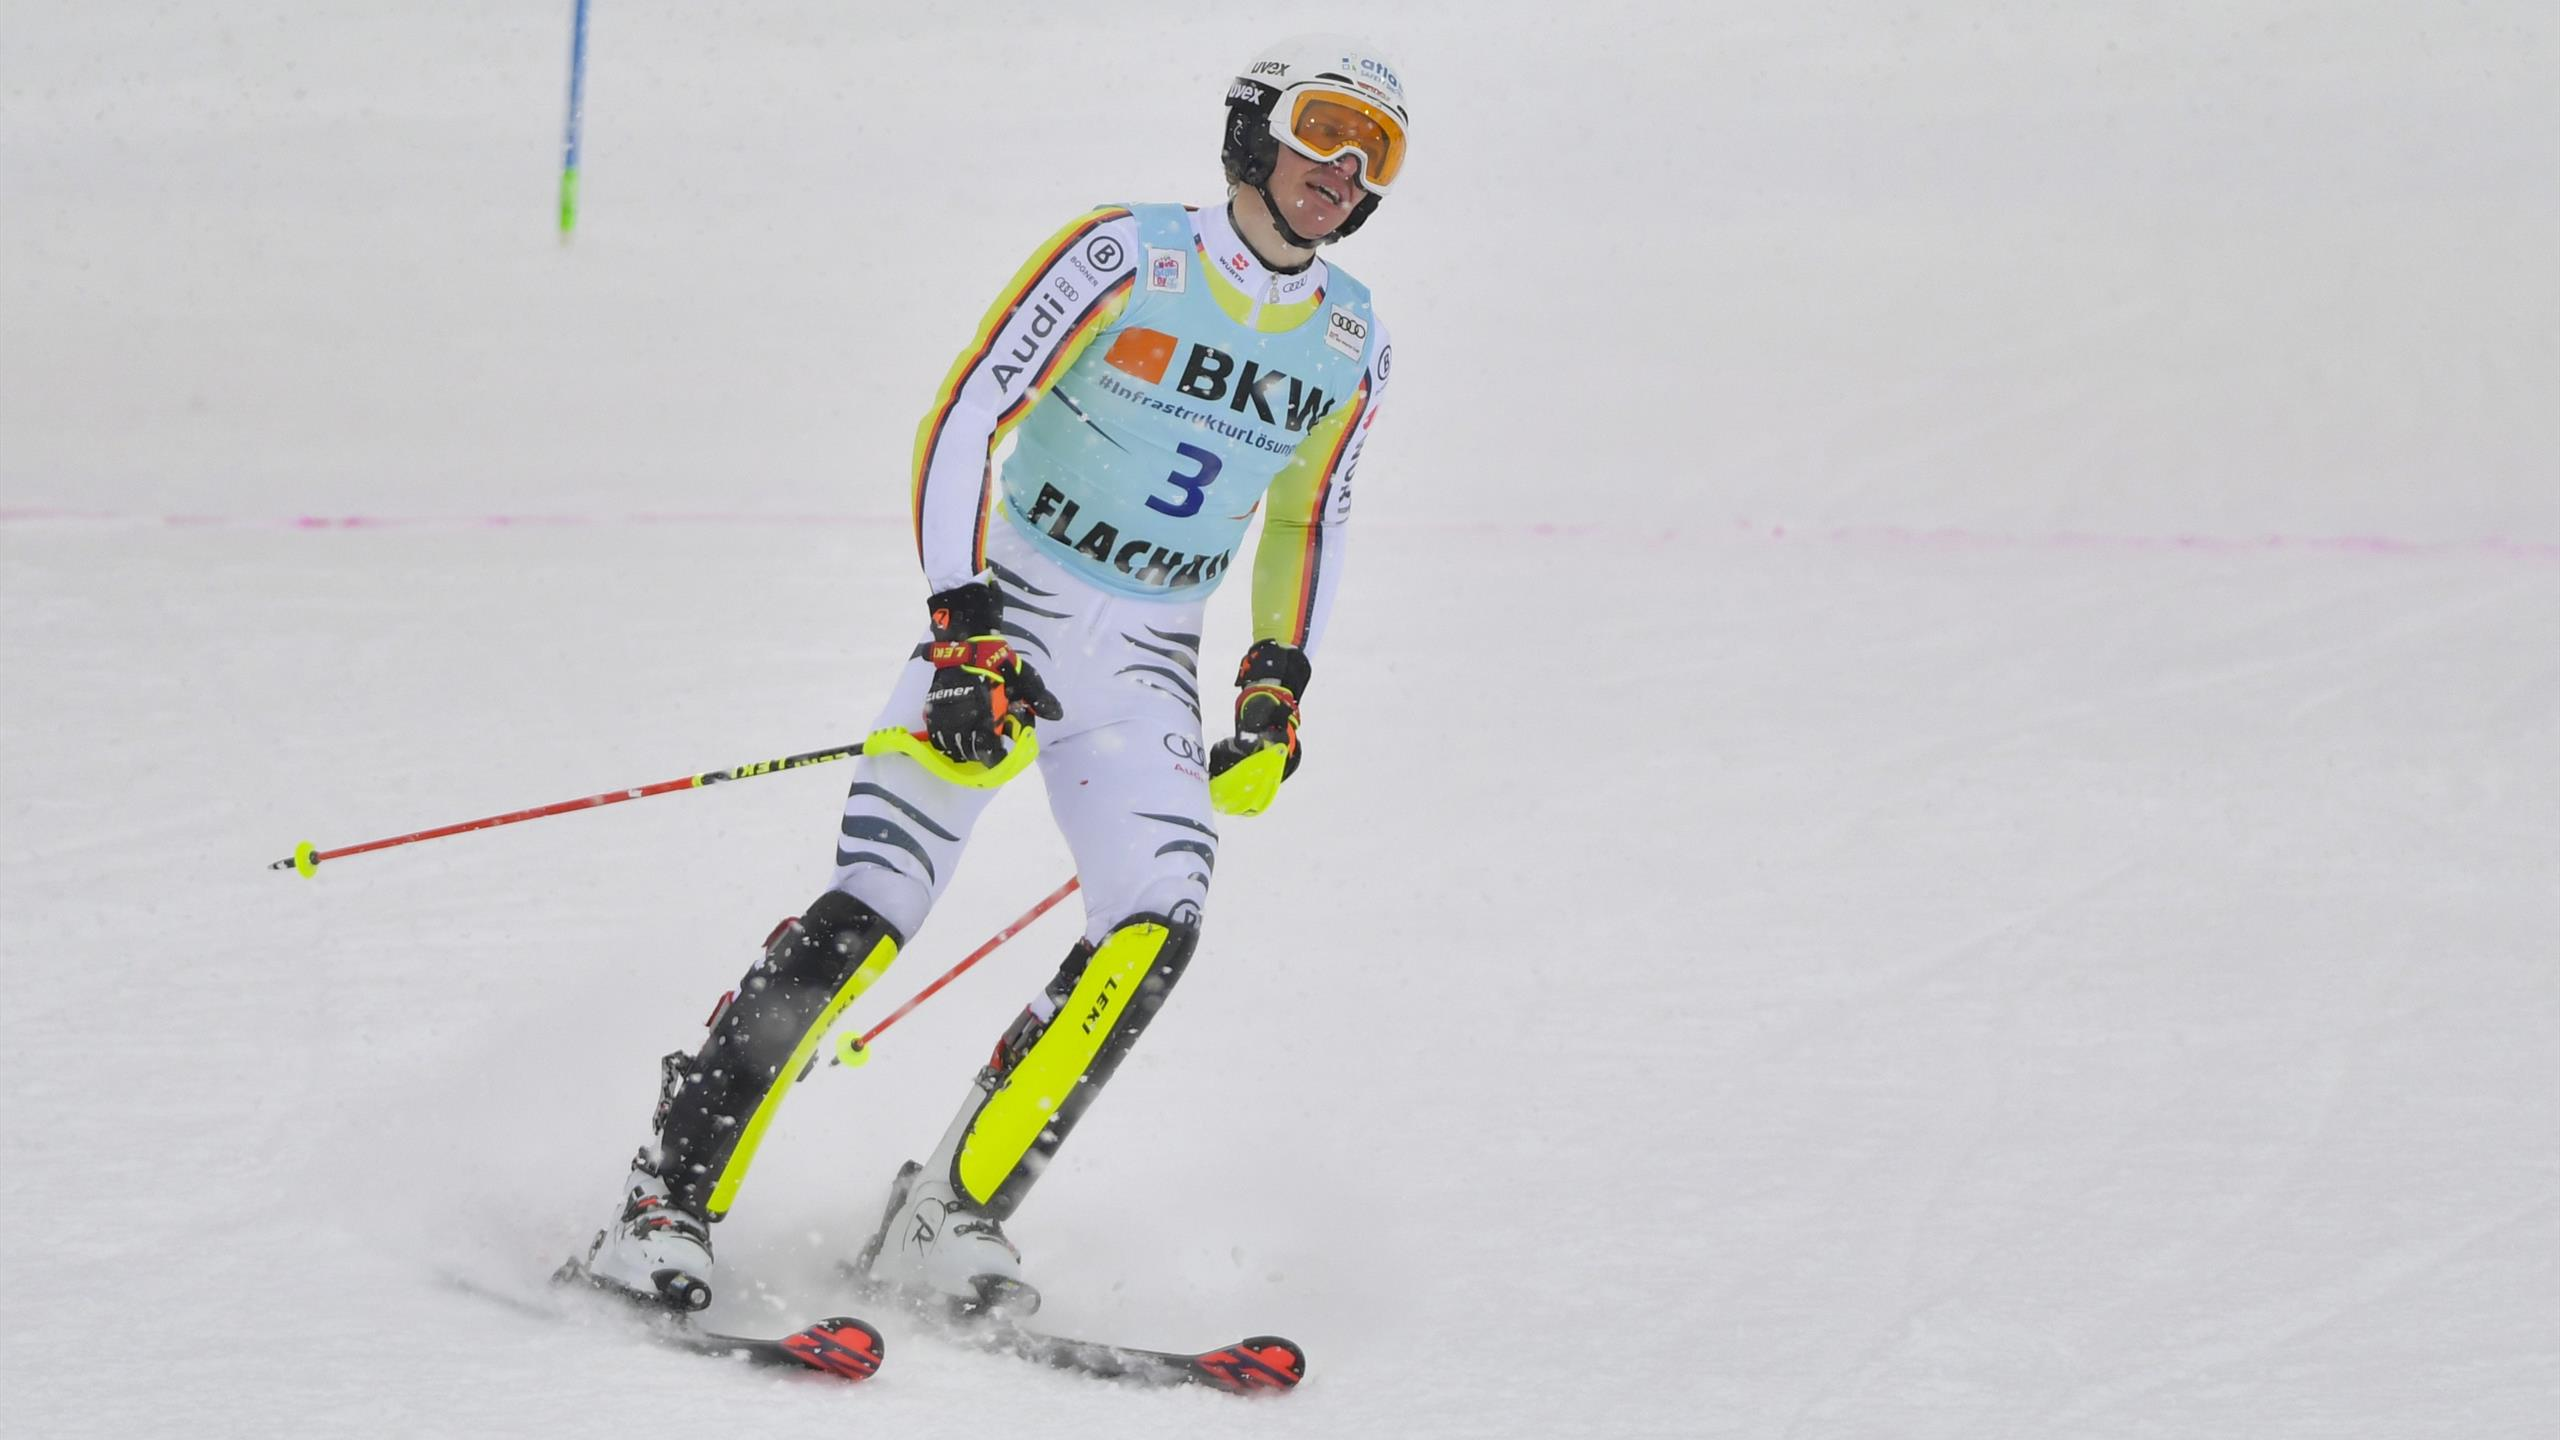 Ergebnis Slalom Heute